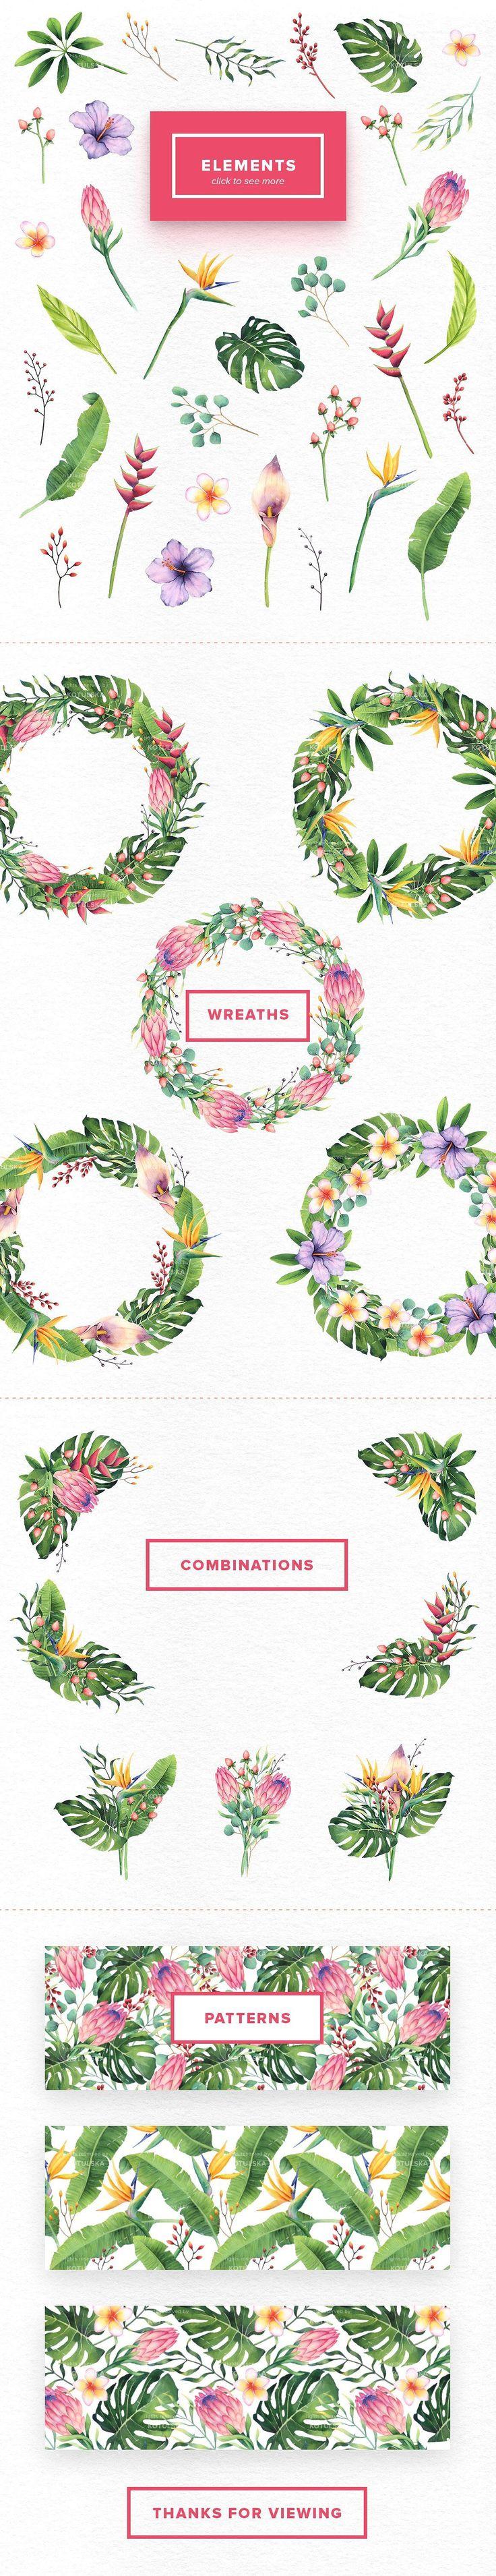 Watercolor Tropical Flowers Set by Kotulska on @creativemarket